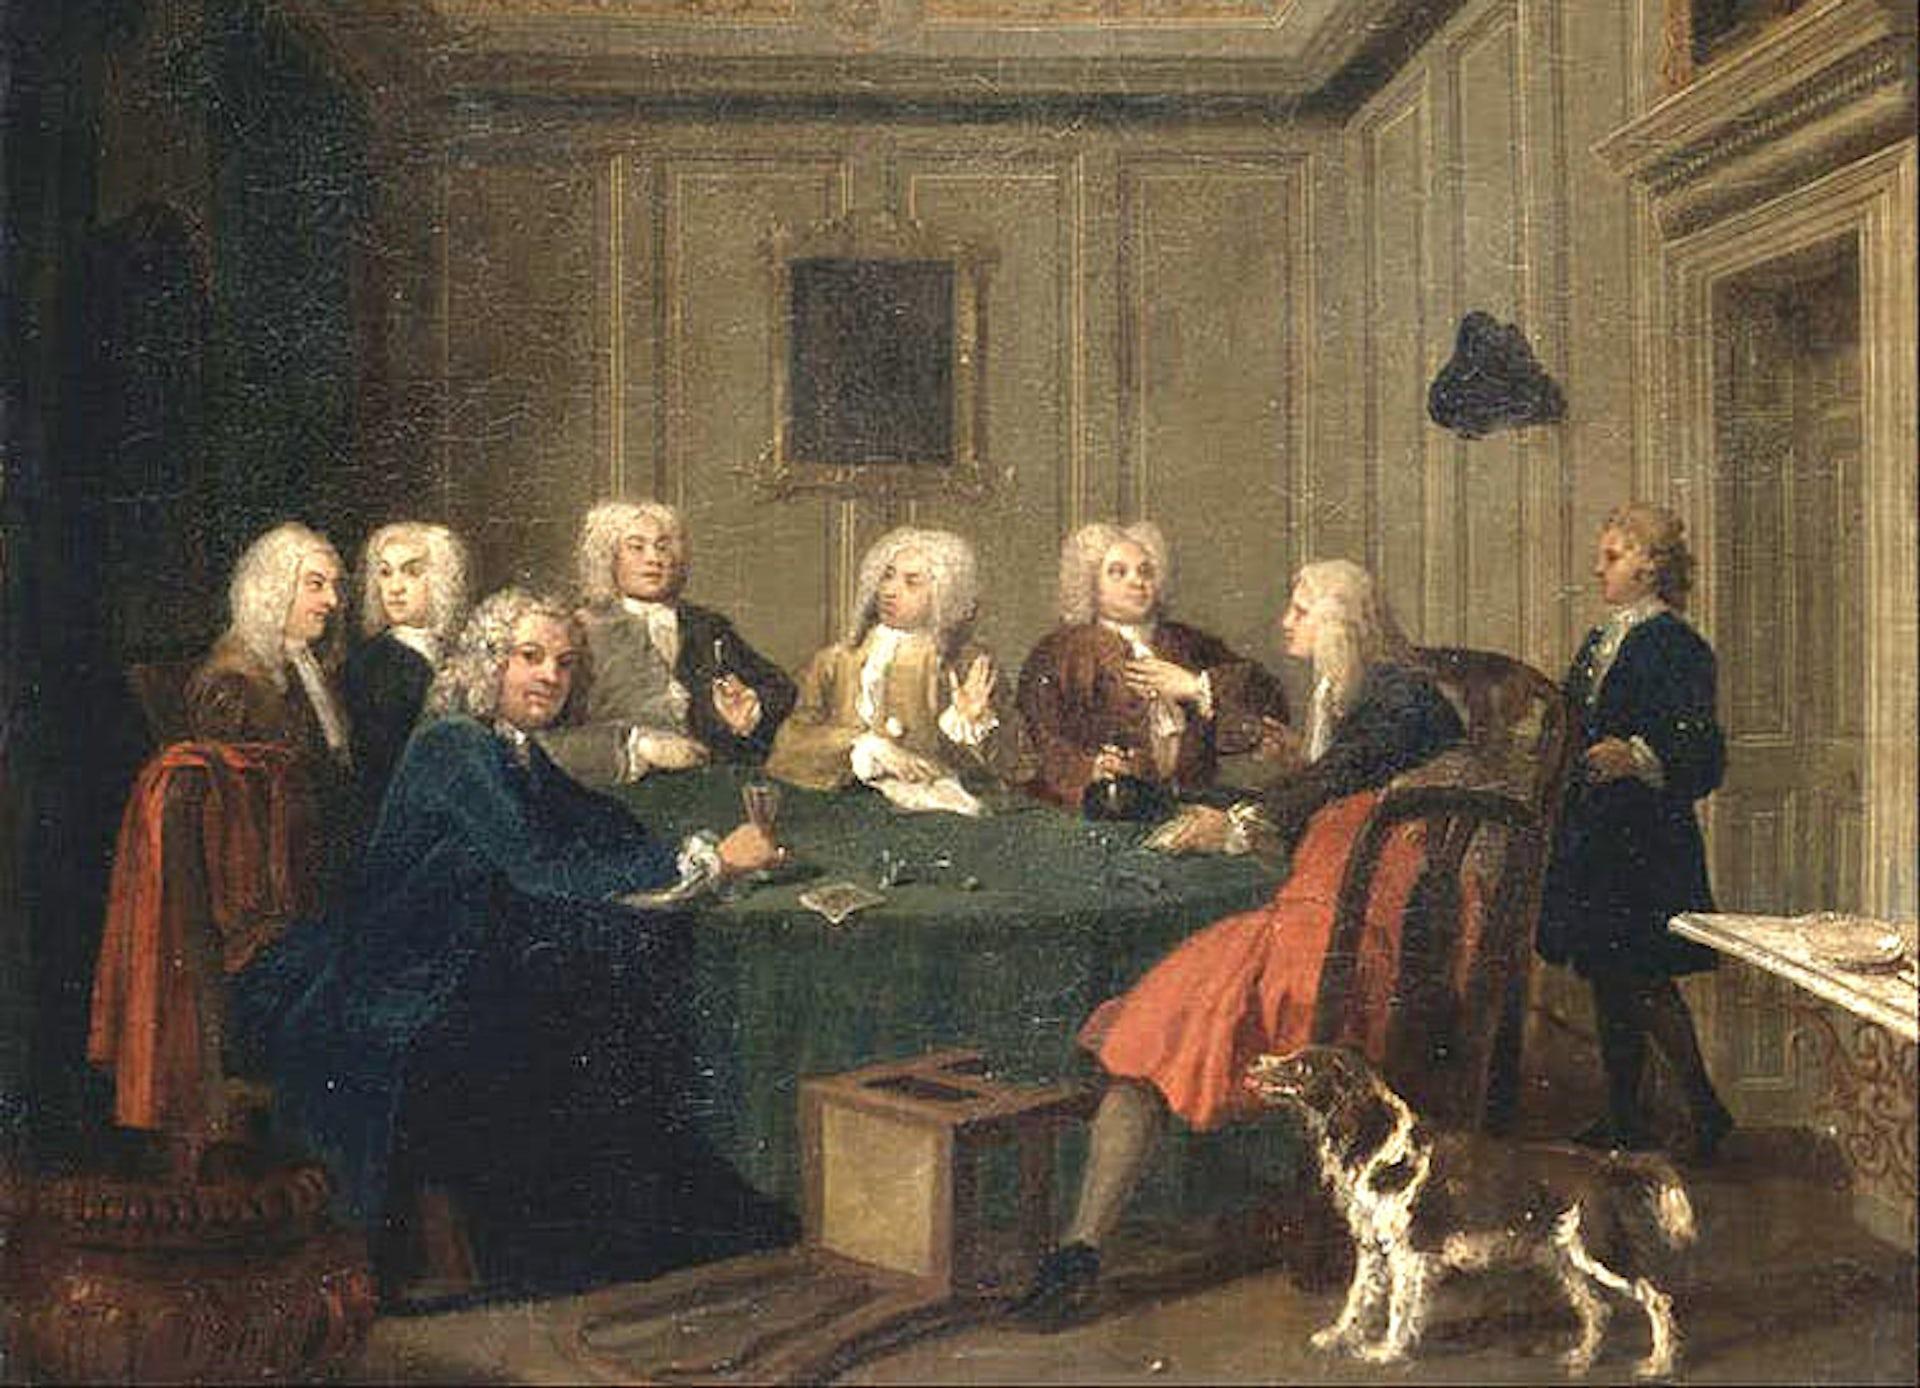 'Club of Gentlemen', circa 1730. Joseph Highmore/Wikimedia, CC BY